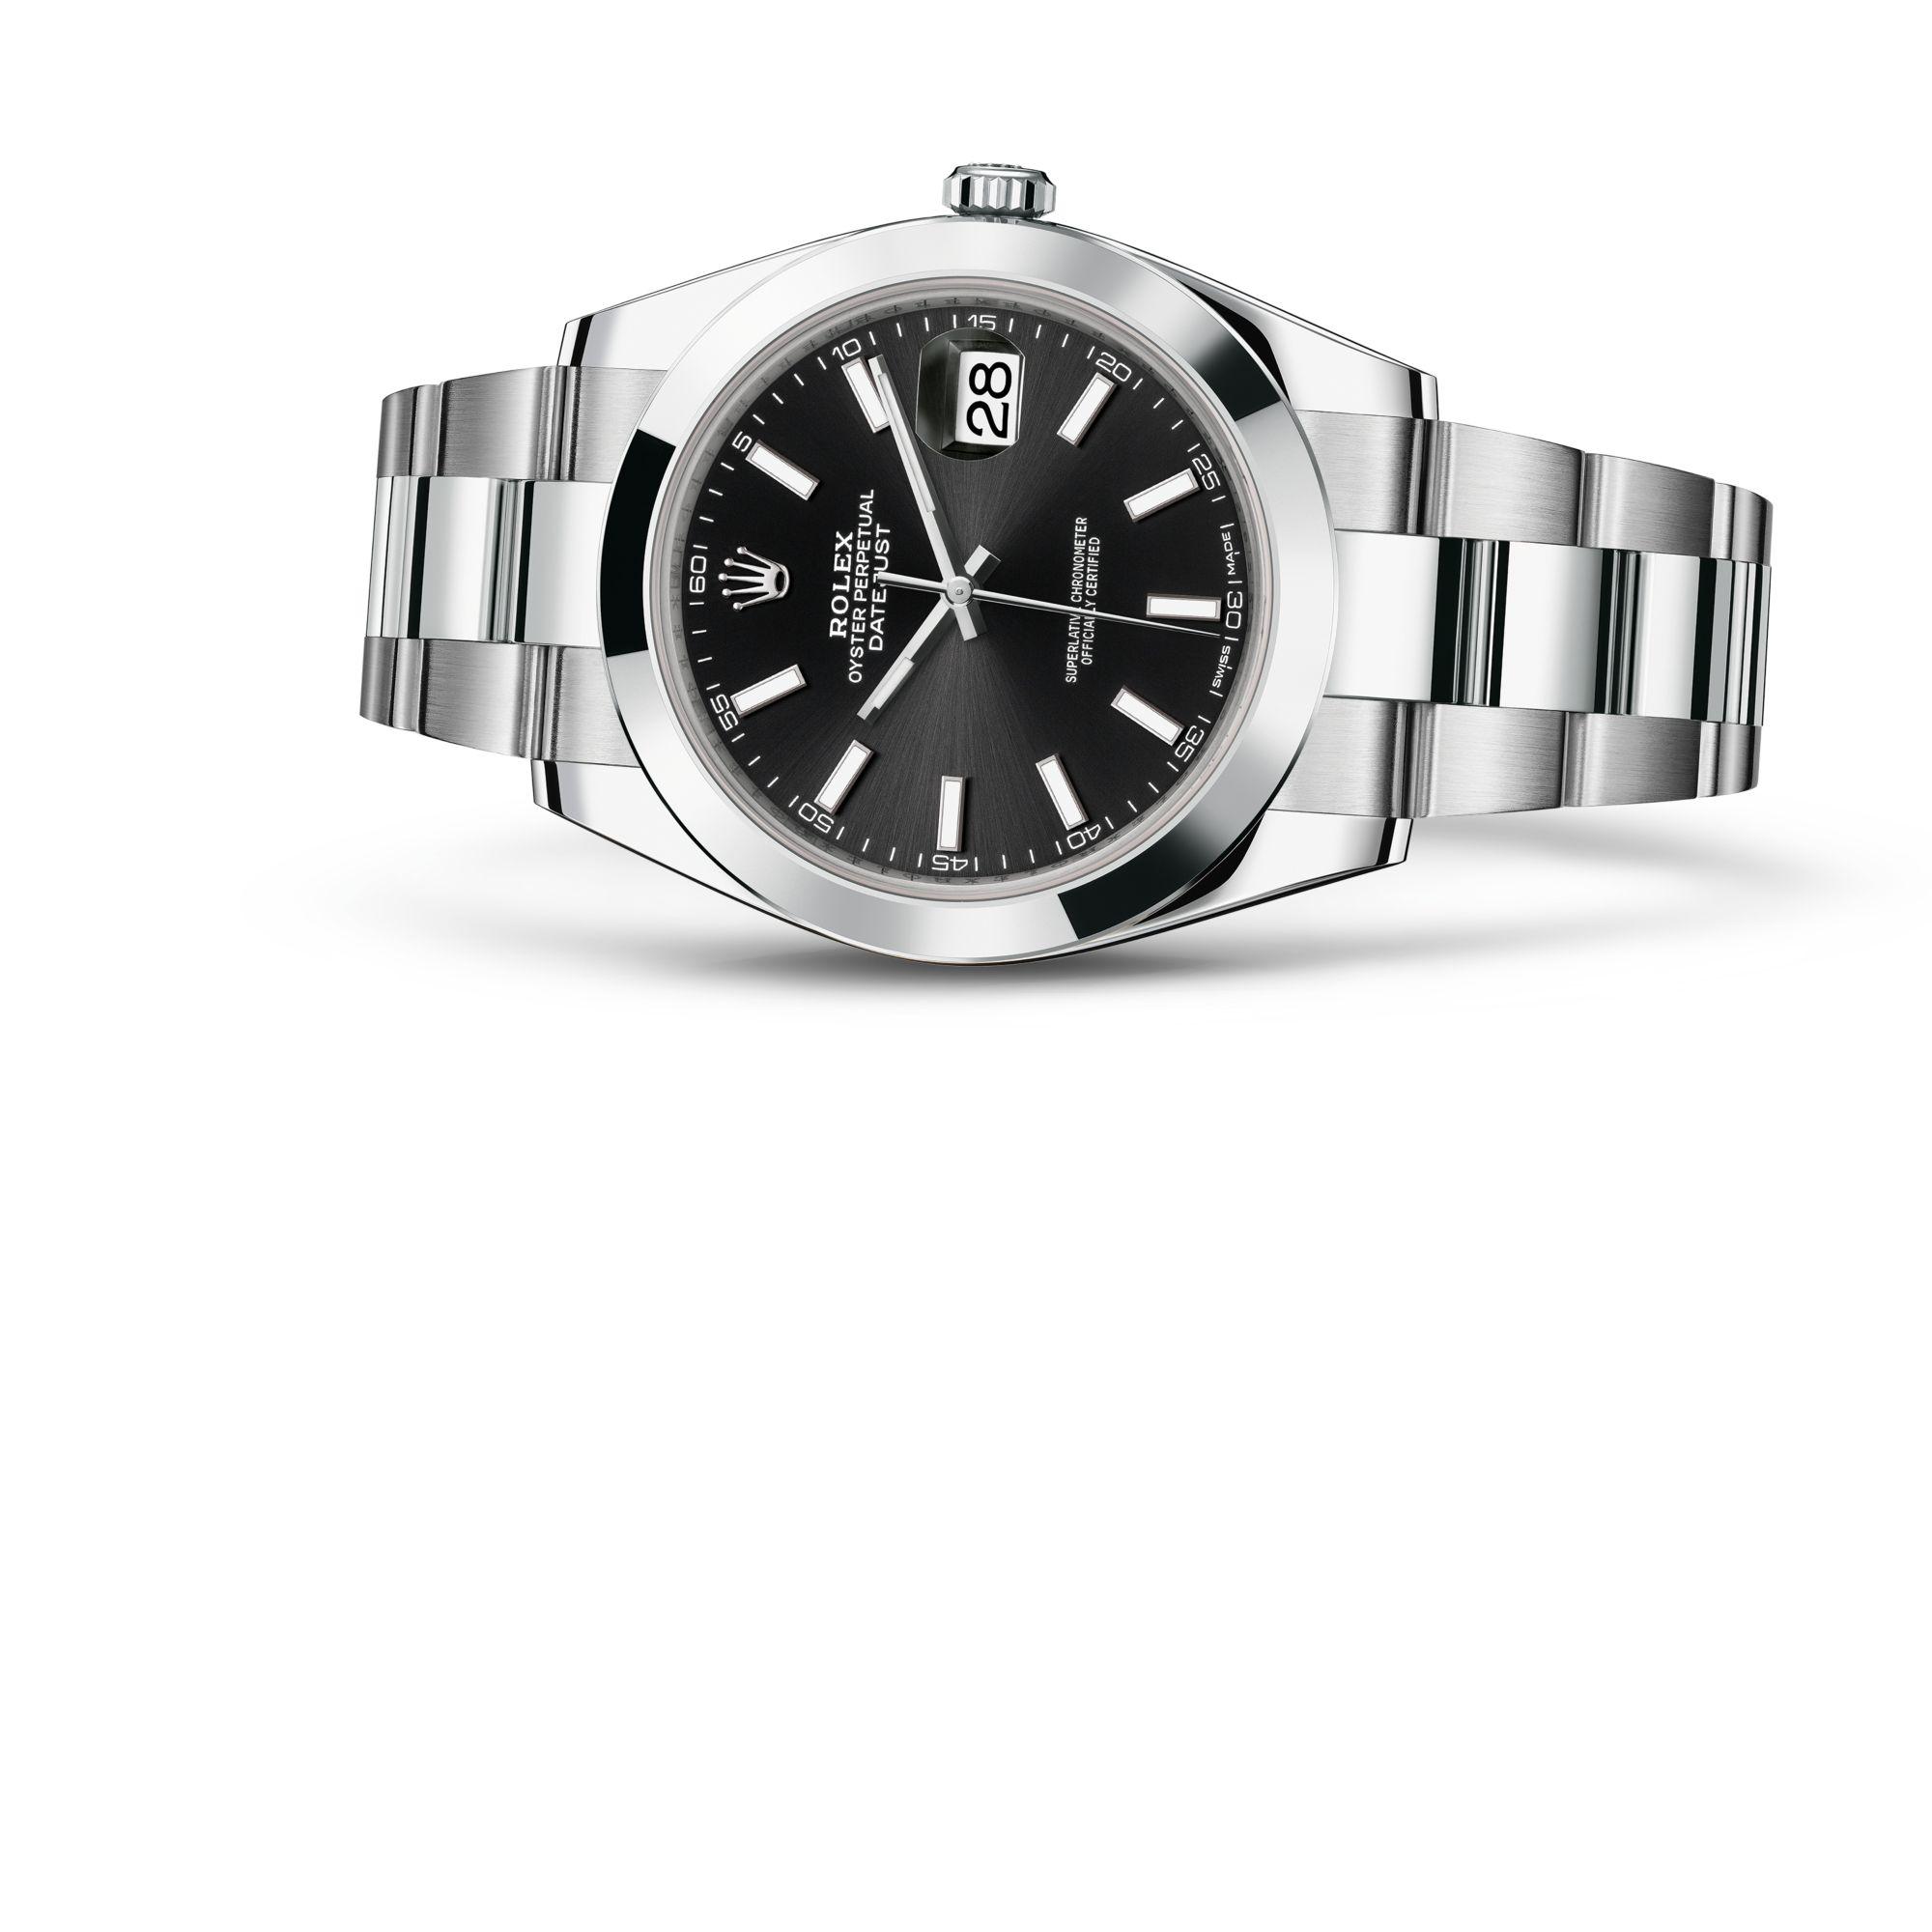 Rolex Datejust 41 M126300-0011